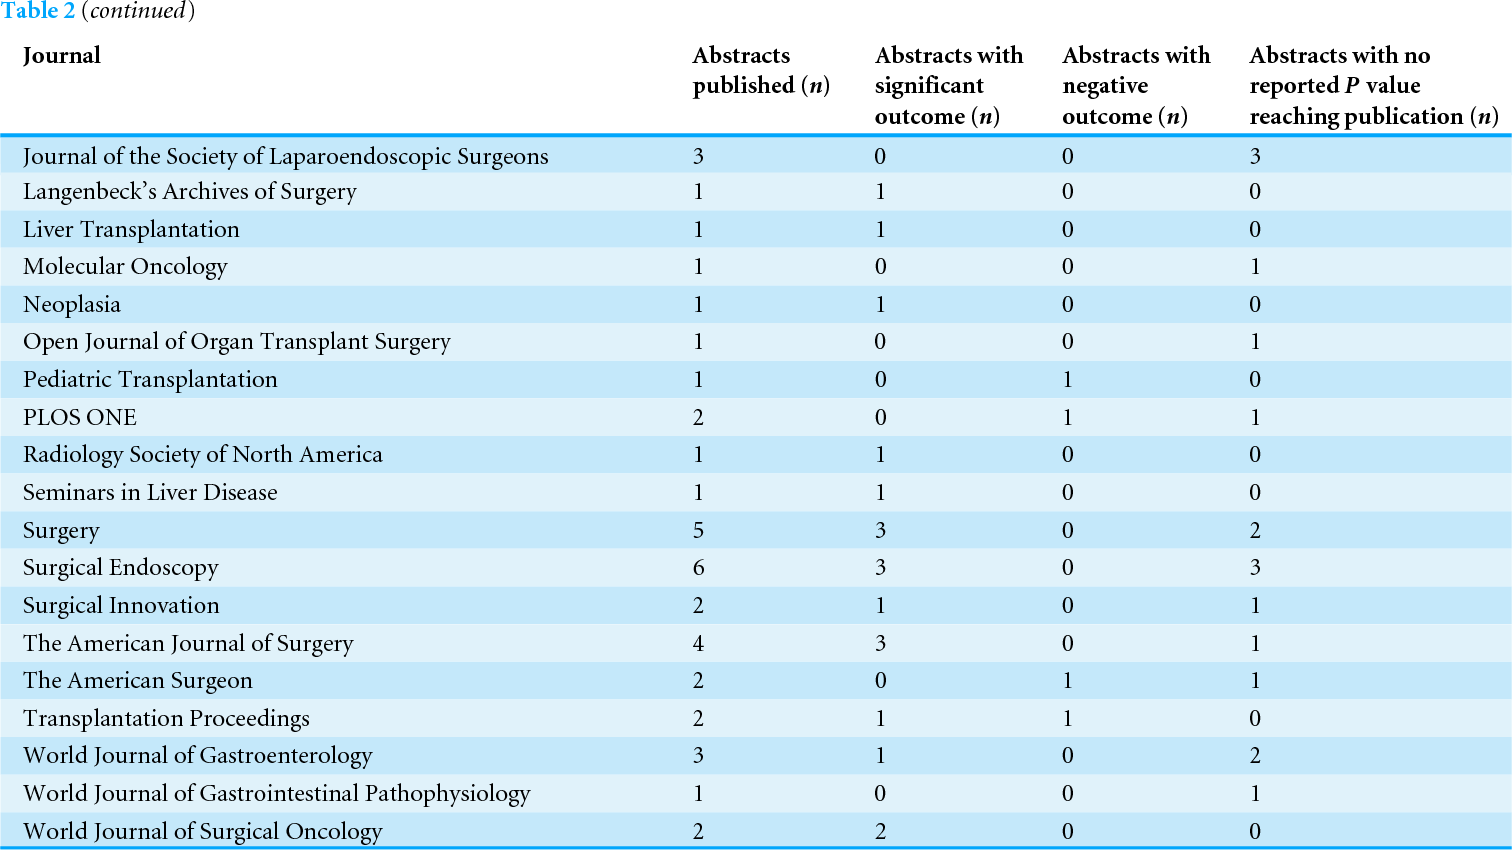 PDF] Is publication bias present in gastroenterological